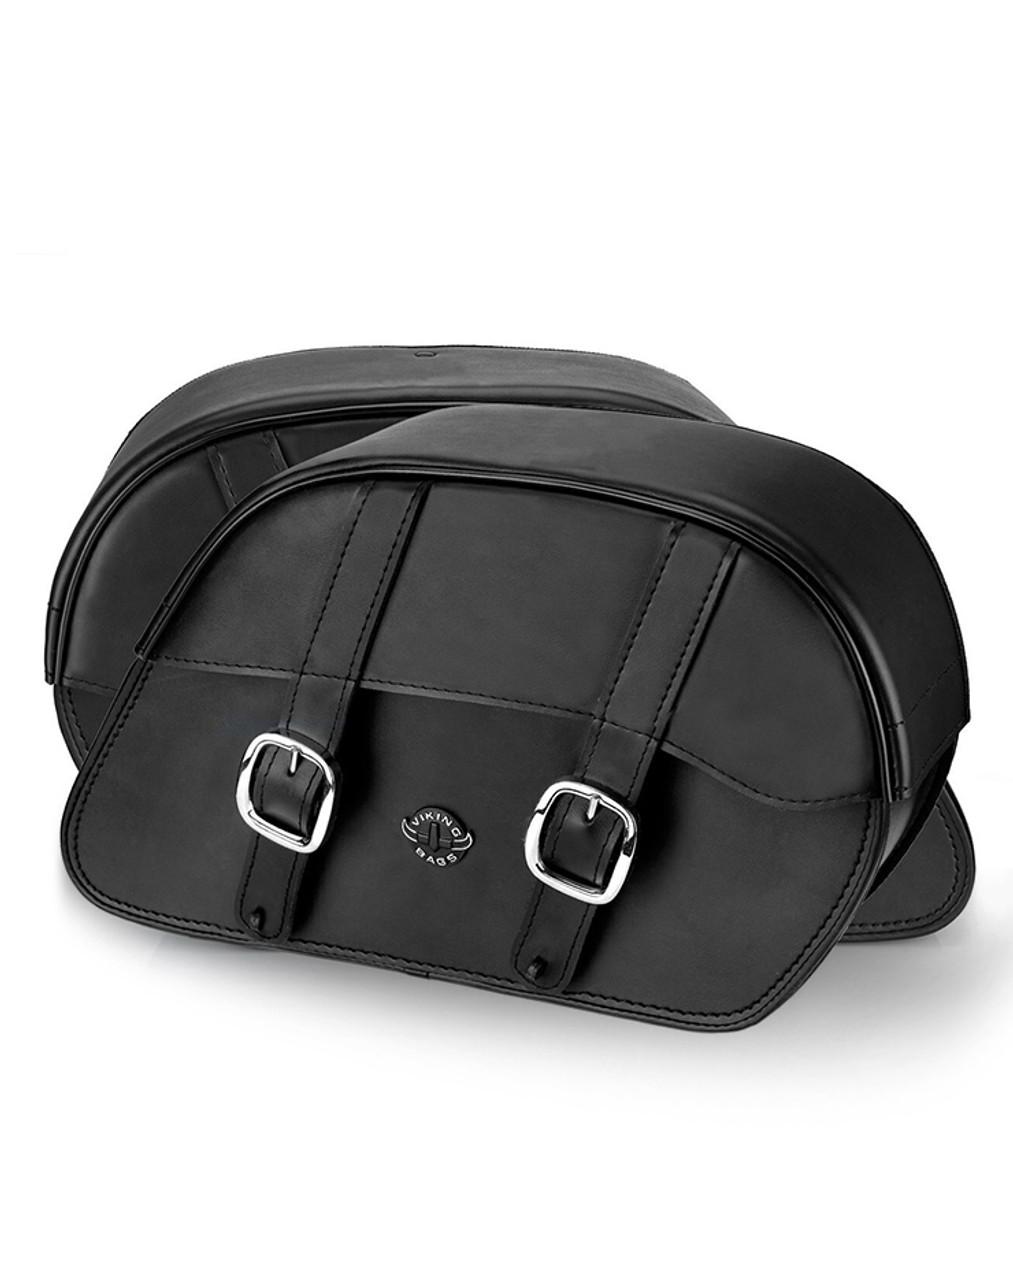 Honda 1100 Shadow Sabre Slant Medium Motorcycle Saddlebags Both Bags view